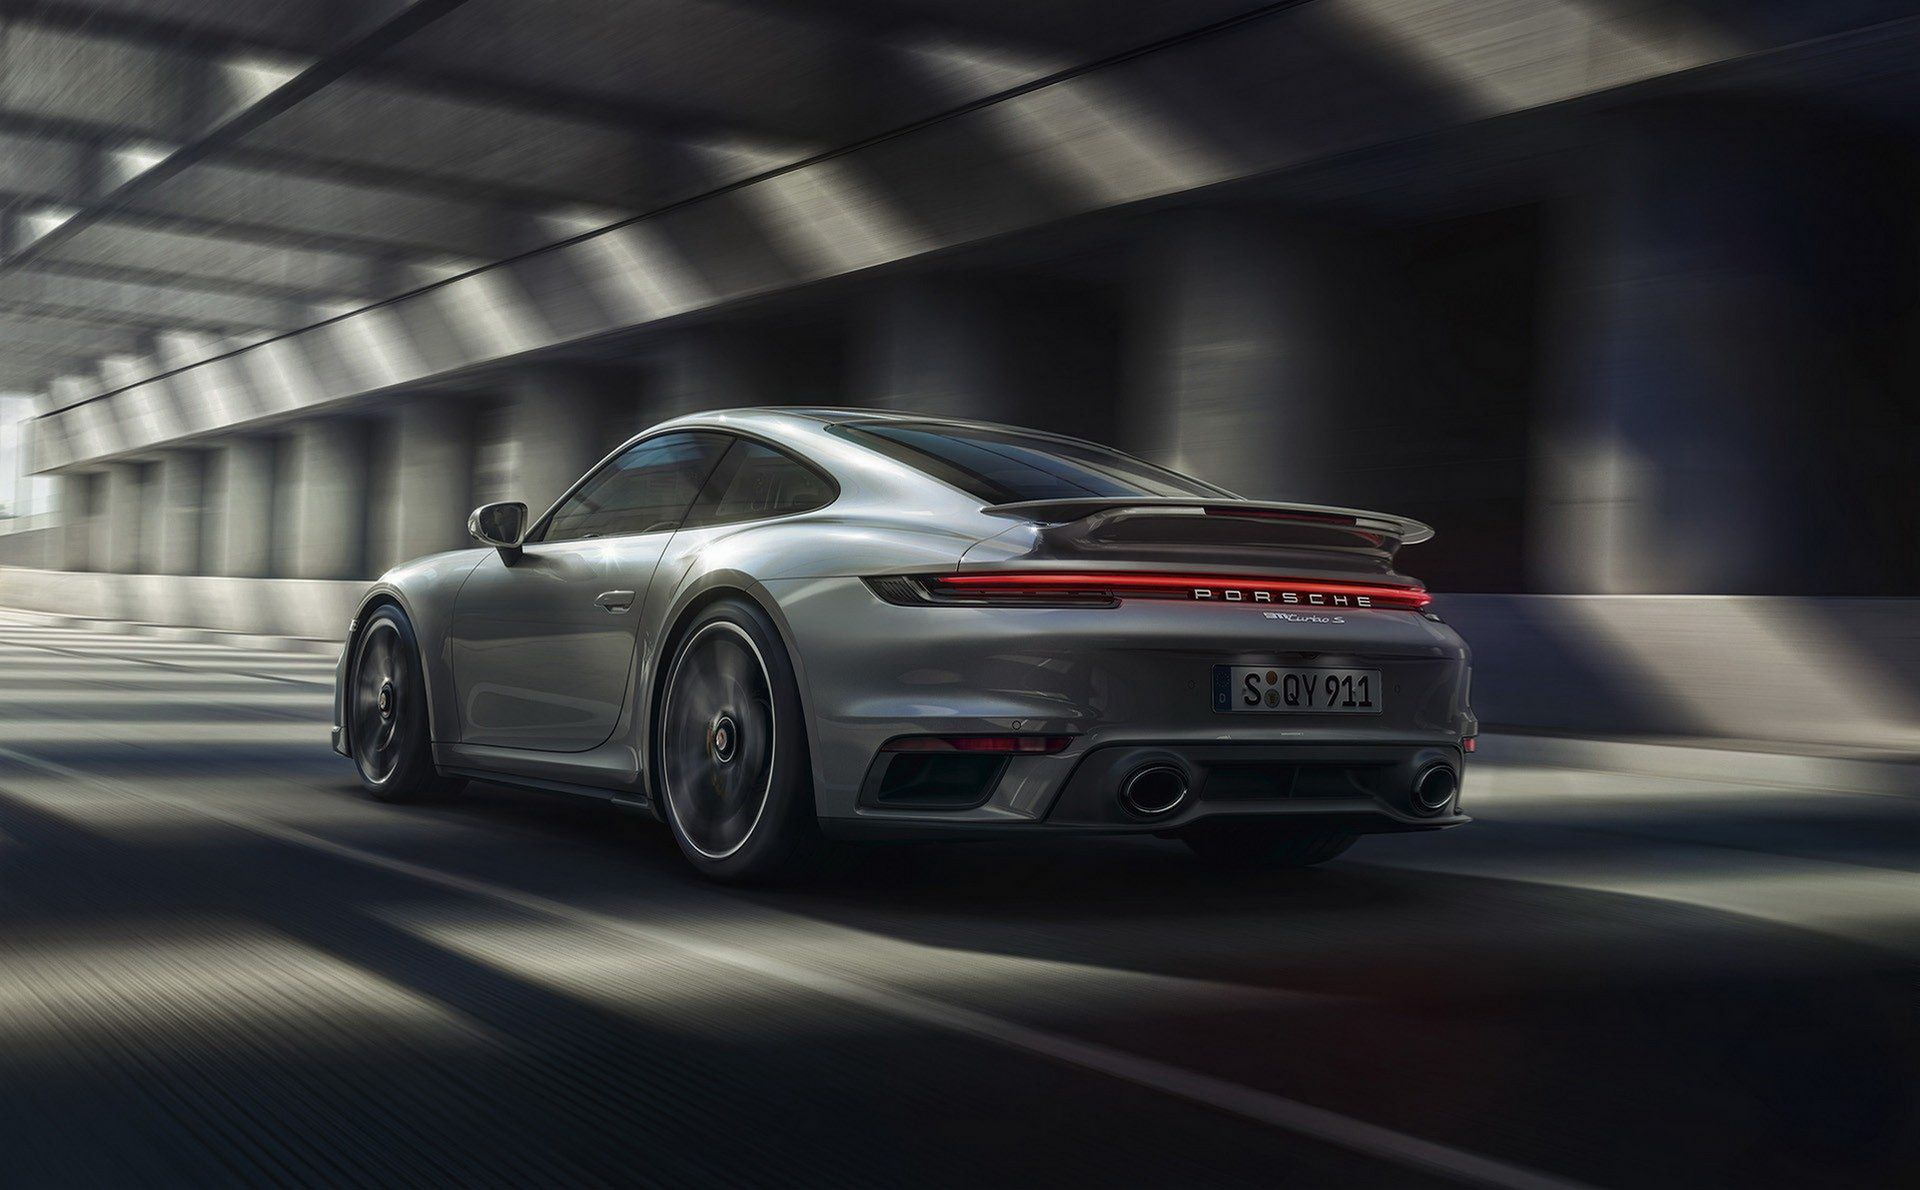 Porsche-911-Turbo-S-2020-10